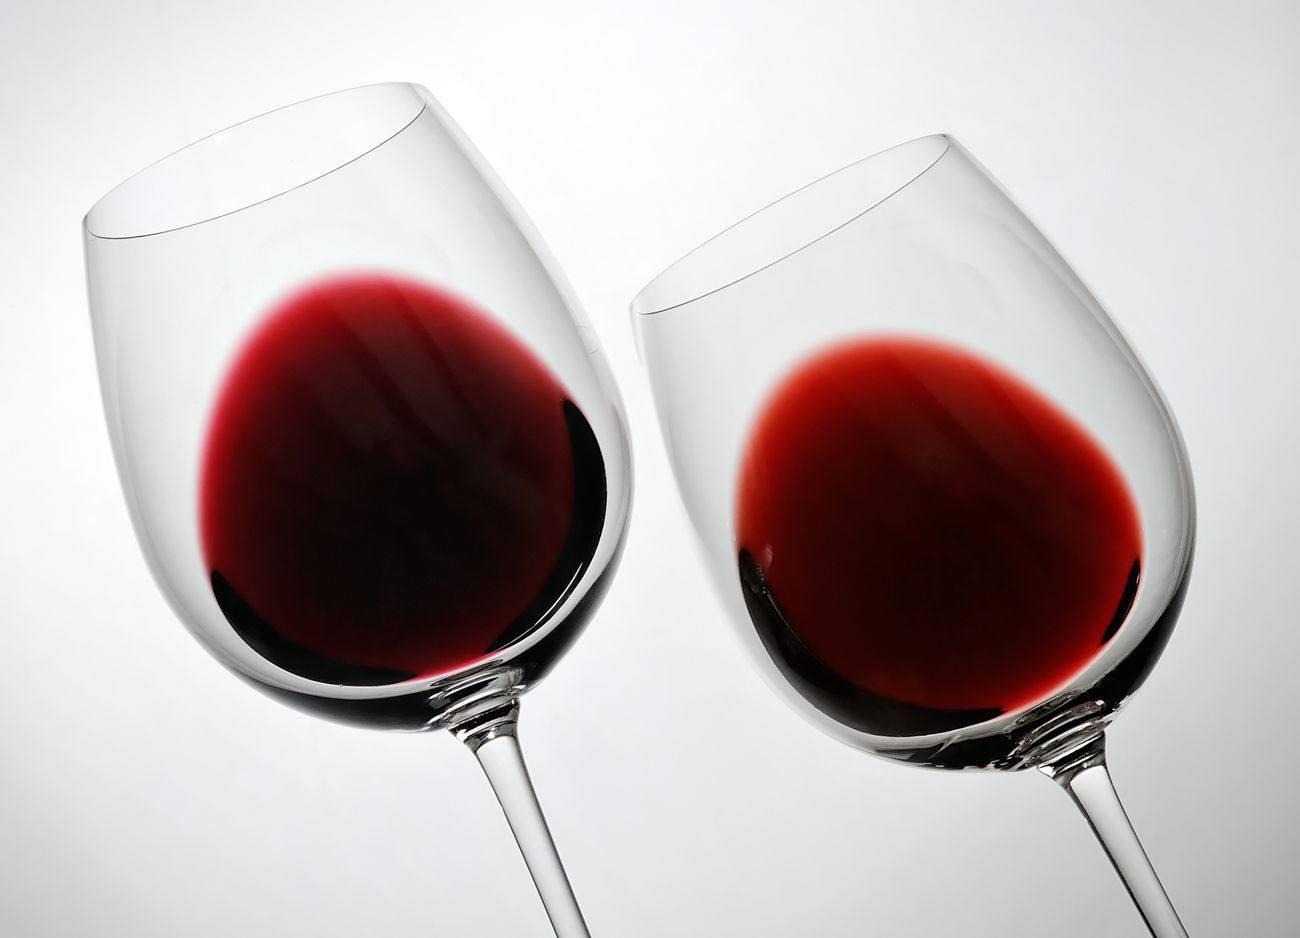 Degustare un vino